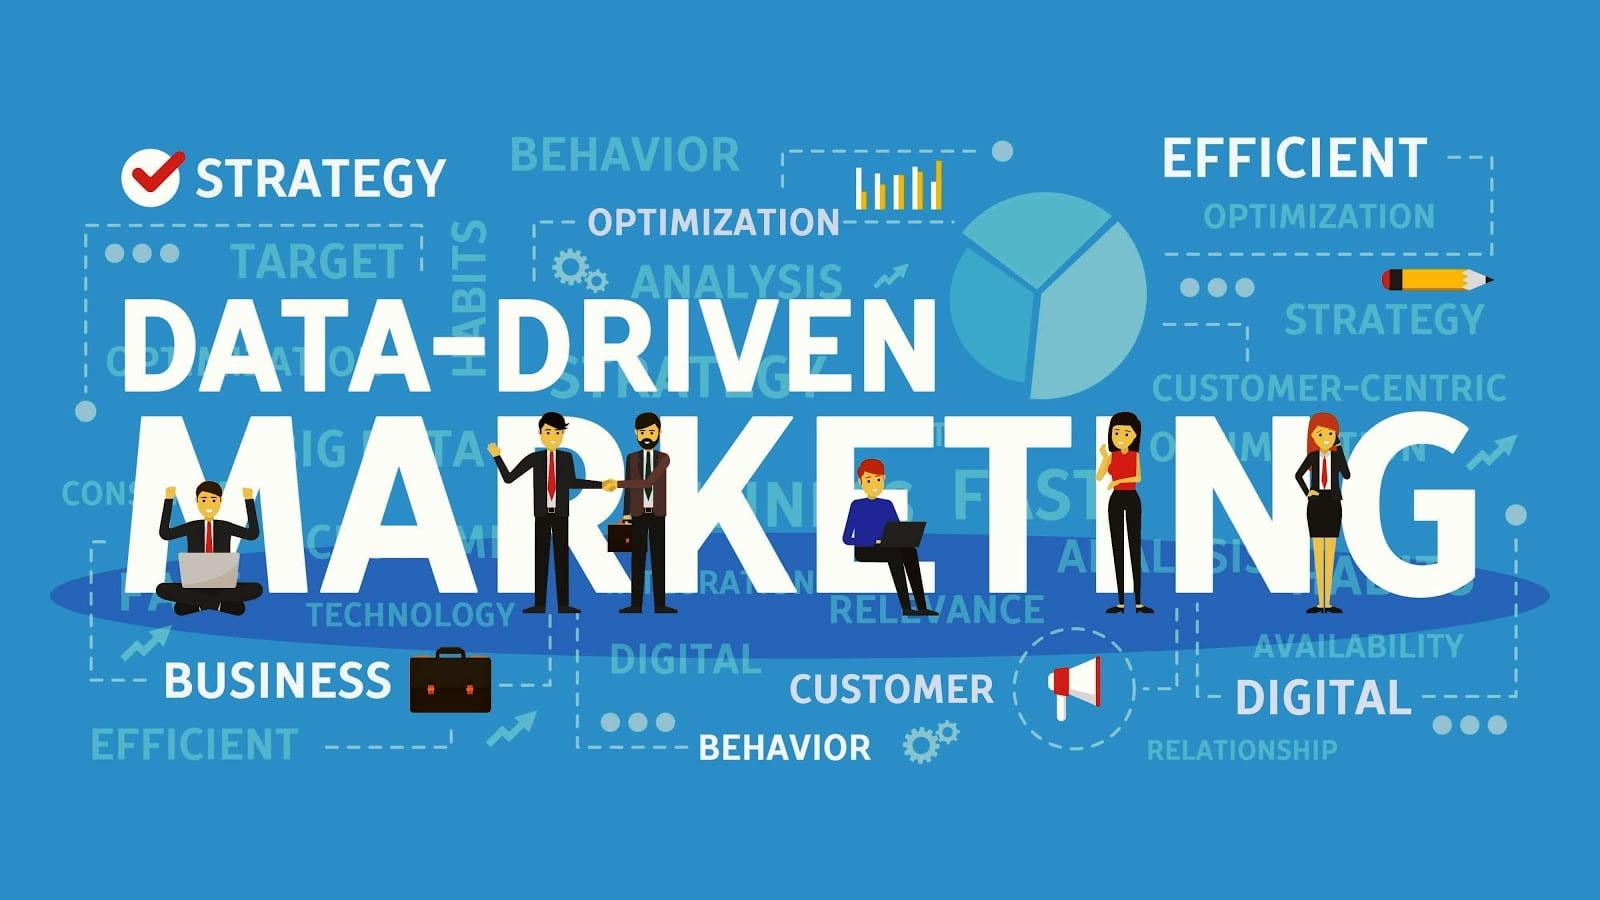 Data-Driven маркетинг